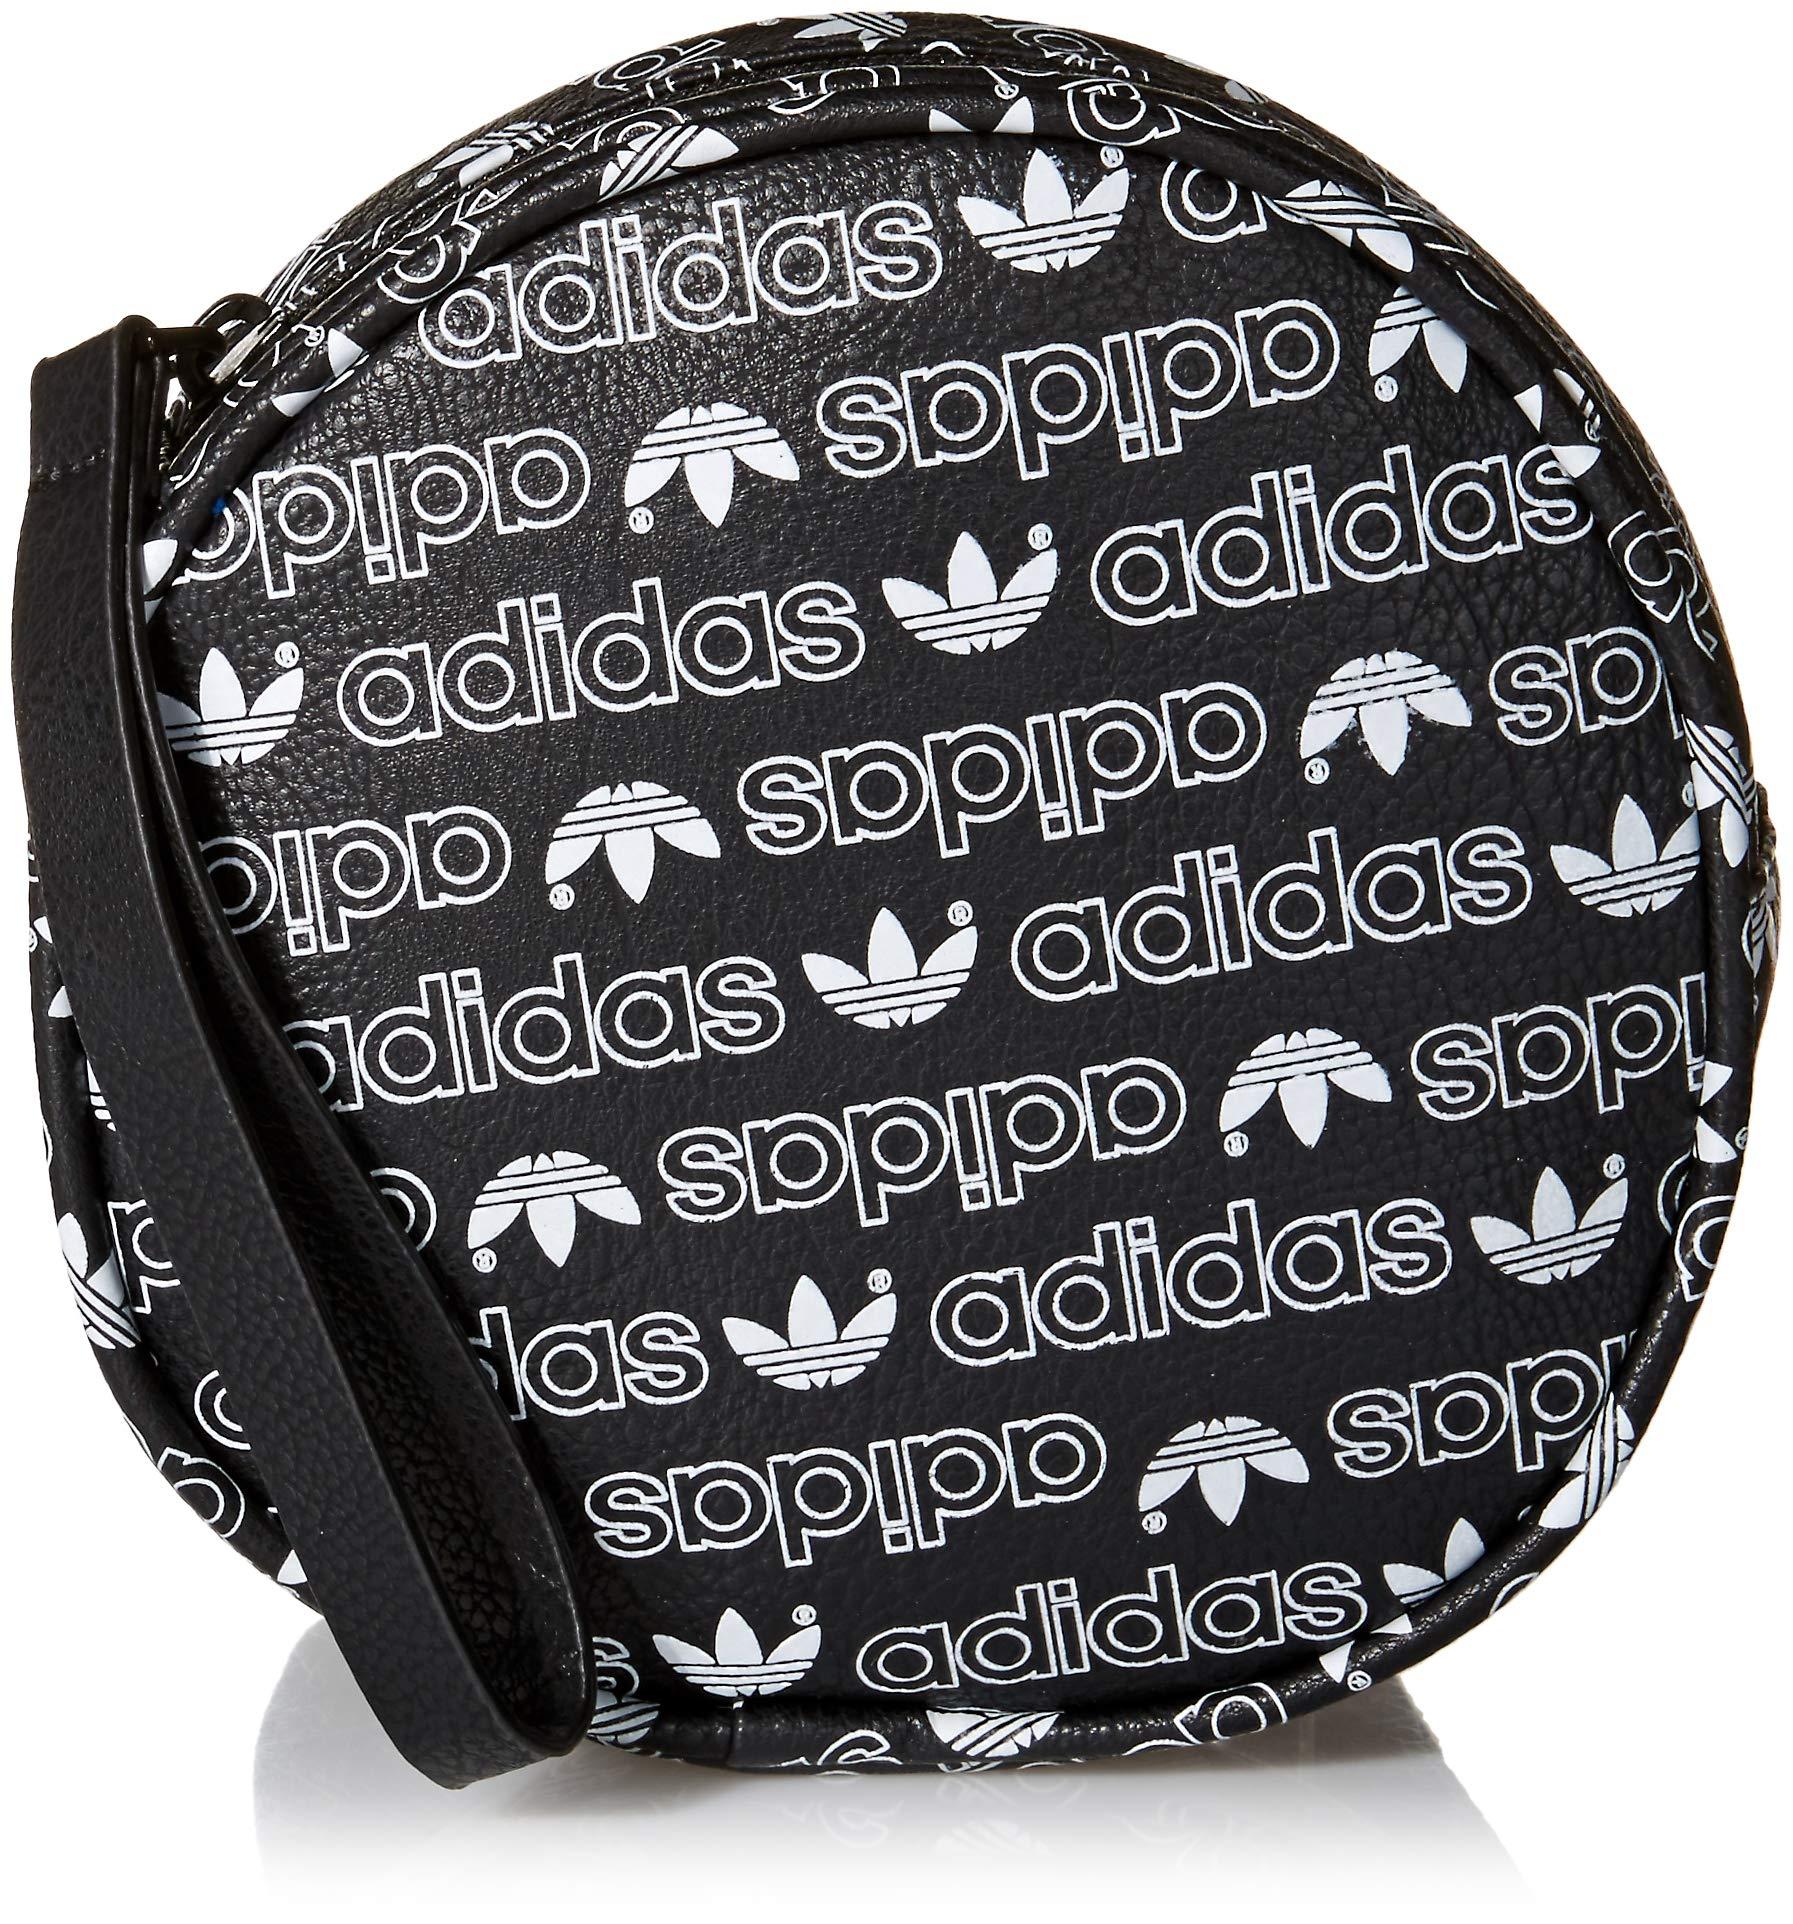 adidas Originals Women's Circle Waist Pack, Black Forum Monogram Small/Black, ONE SIZE by adidas Originals